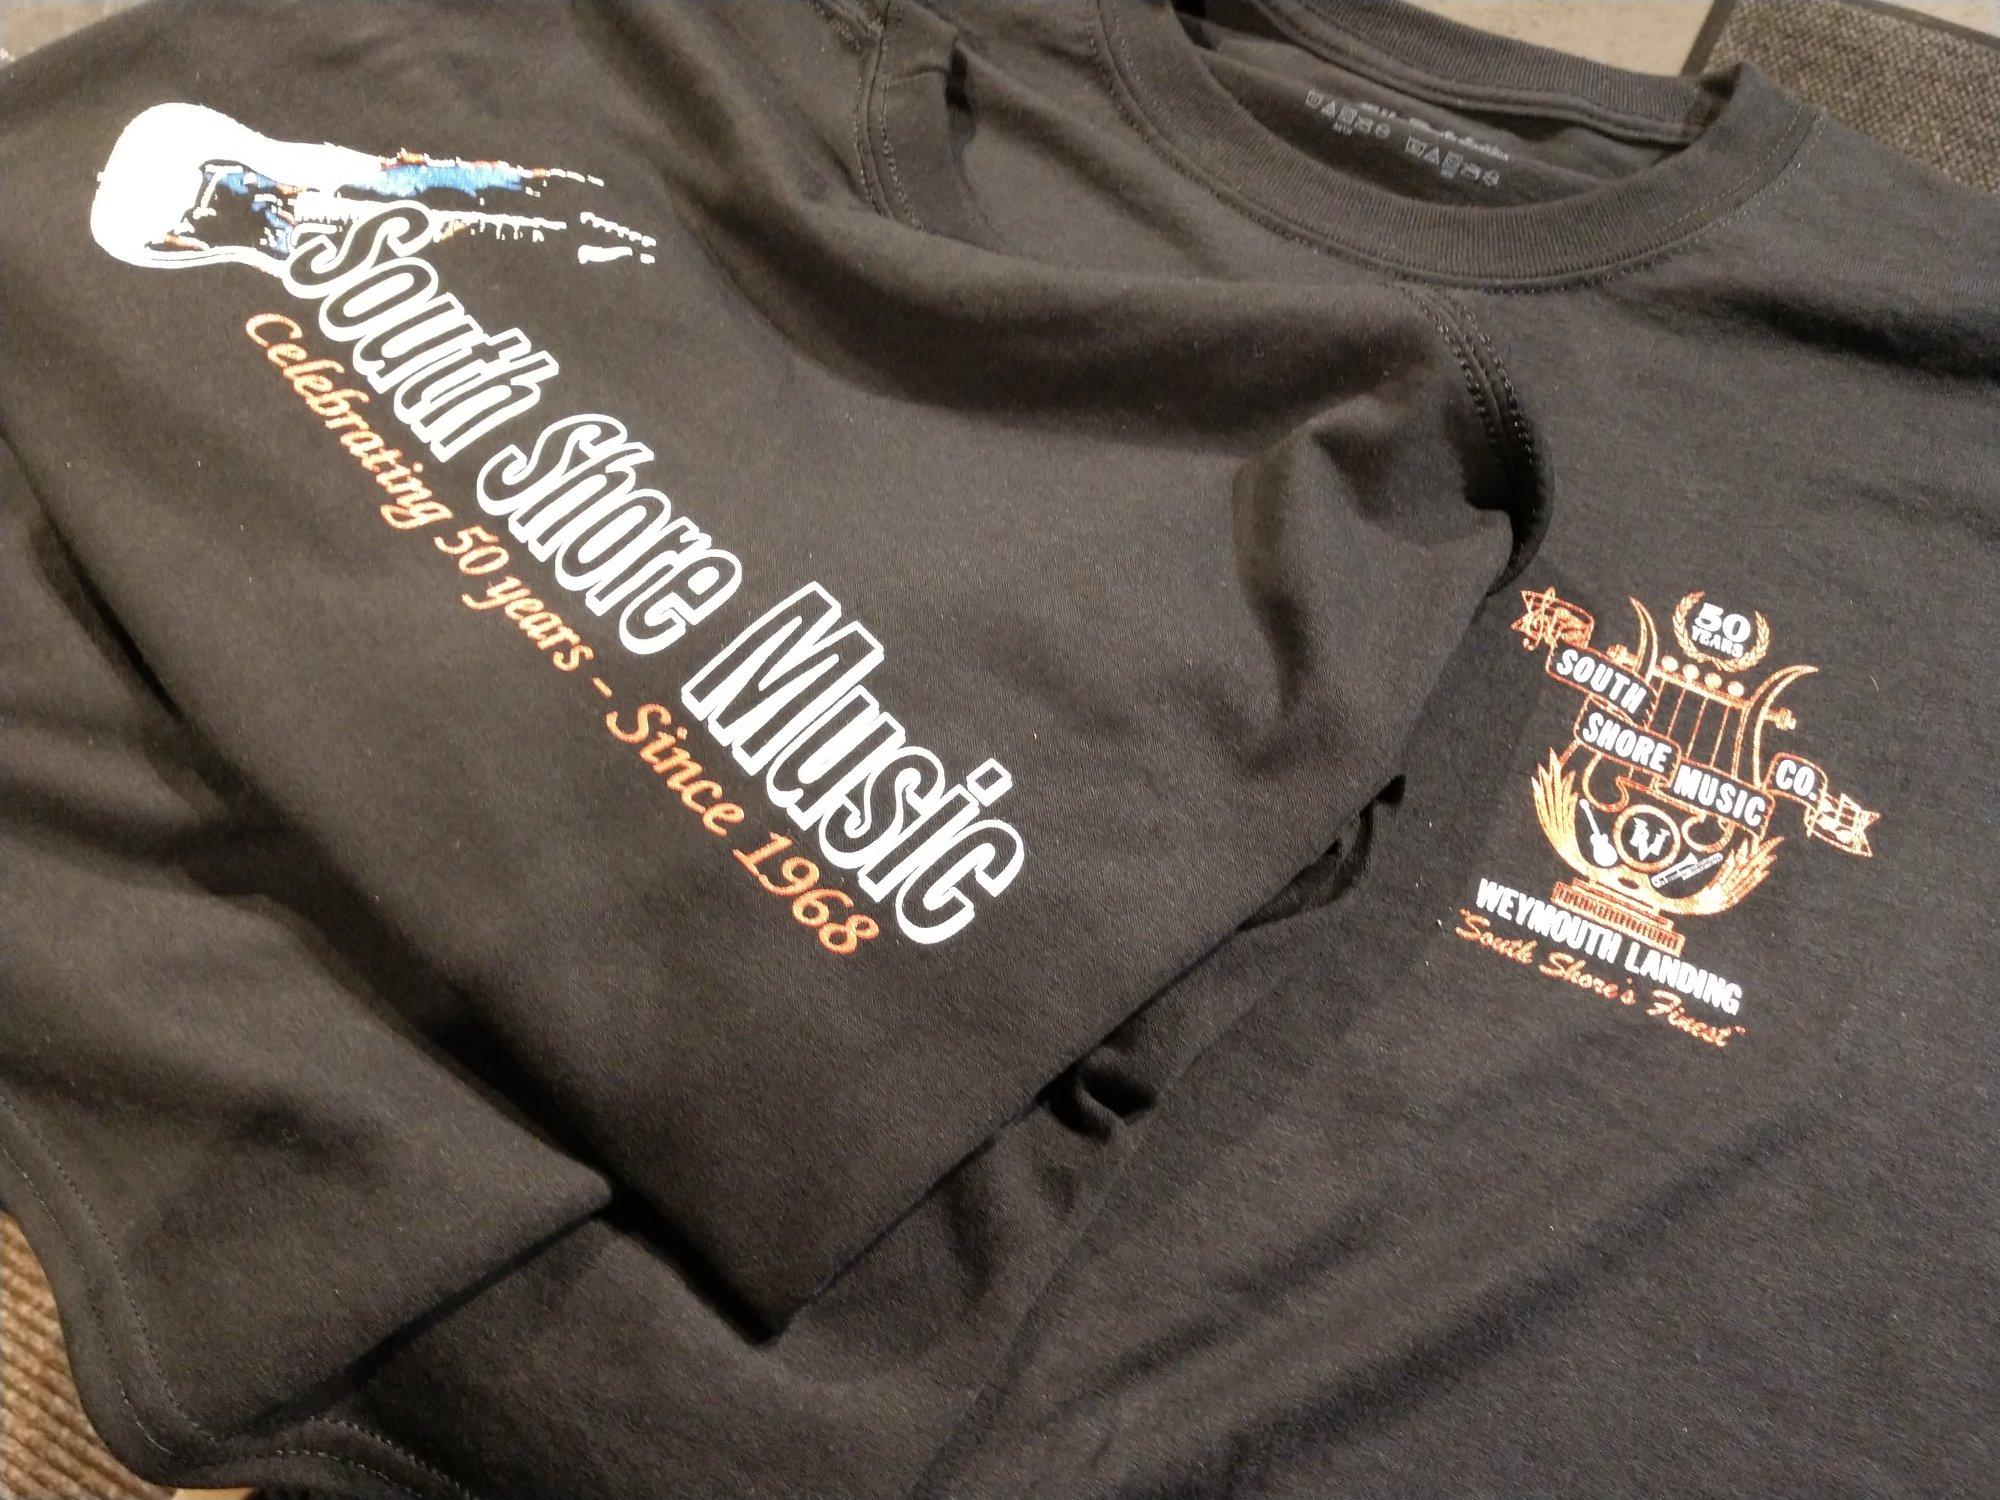 South Shore Music T shirt